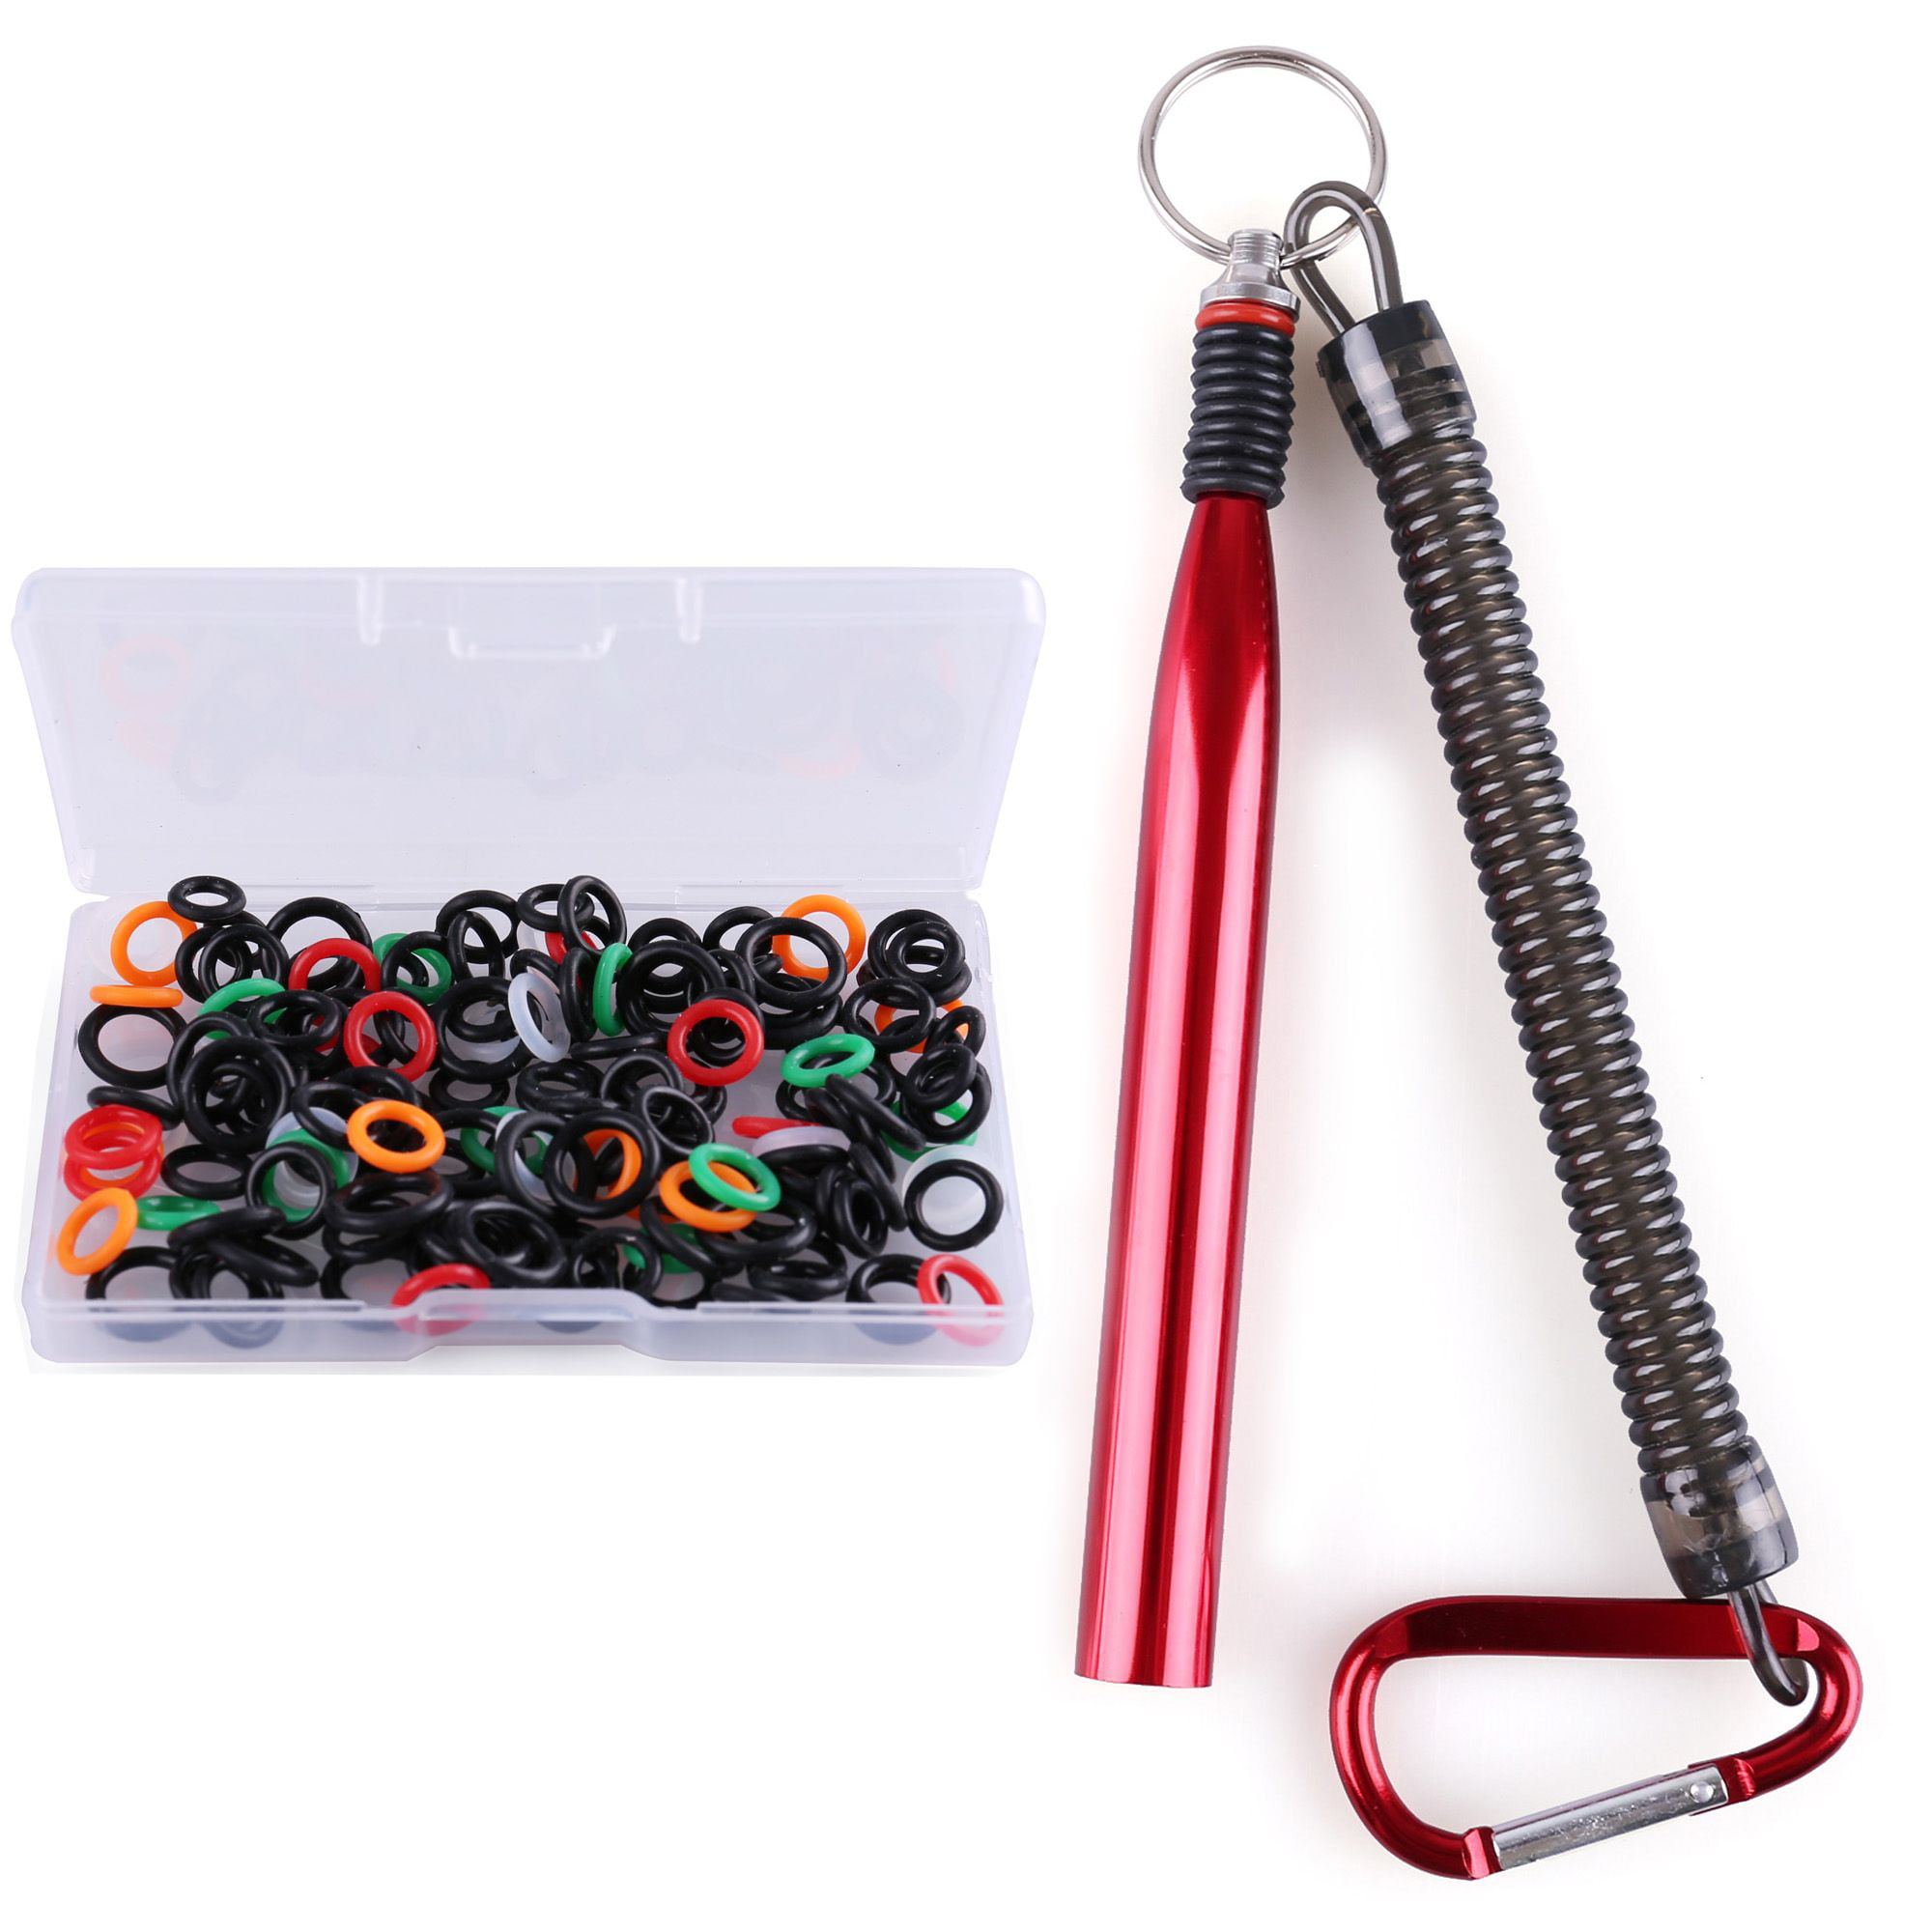 Wacky Worm Tool Wacky Rigging Plastic Senko Style Worm with 100PCS O-Ring NEW